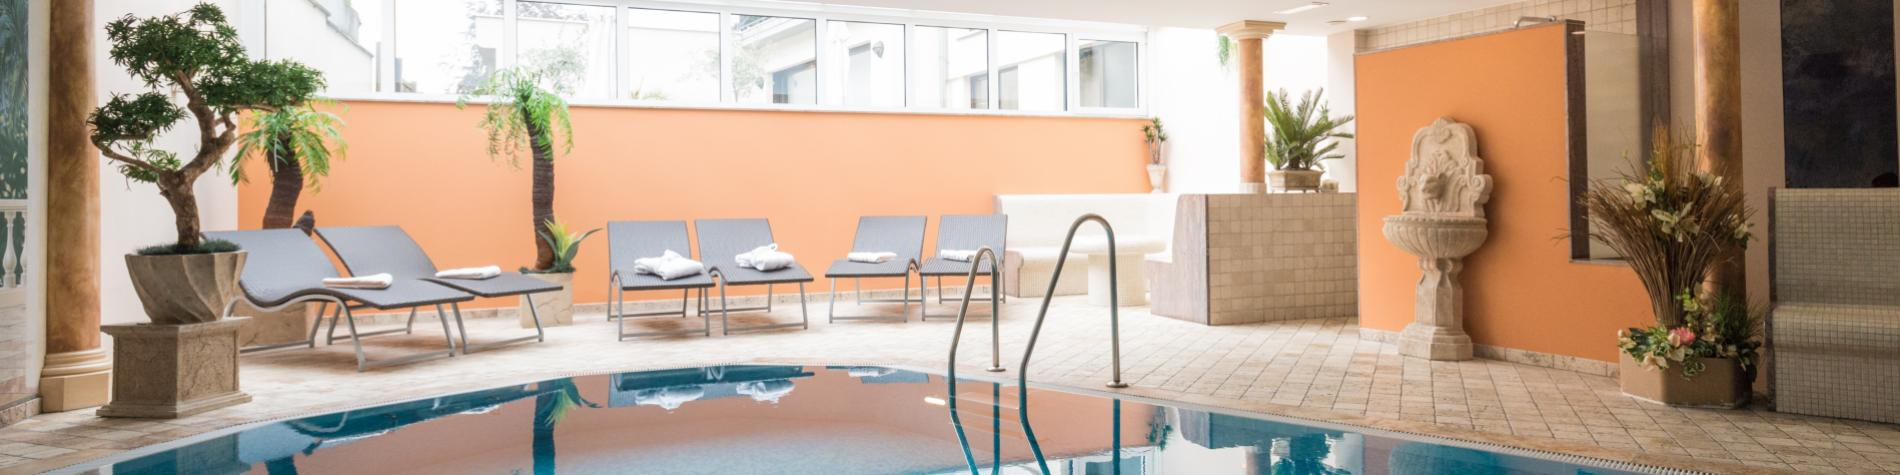 Relax-Hotel Pip-Margraff